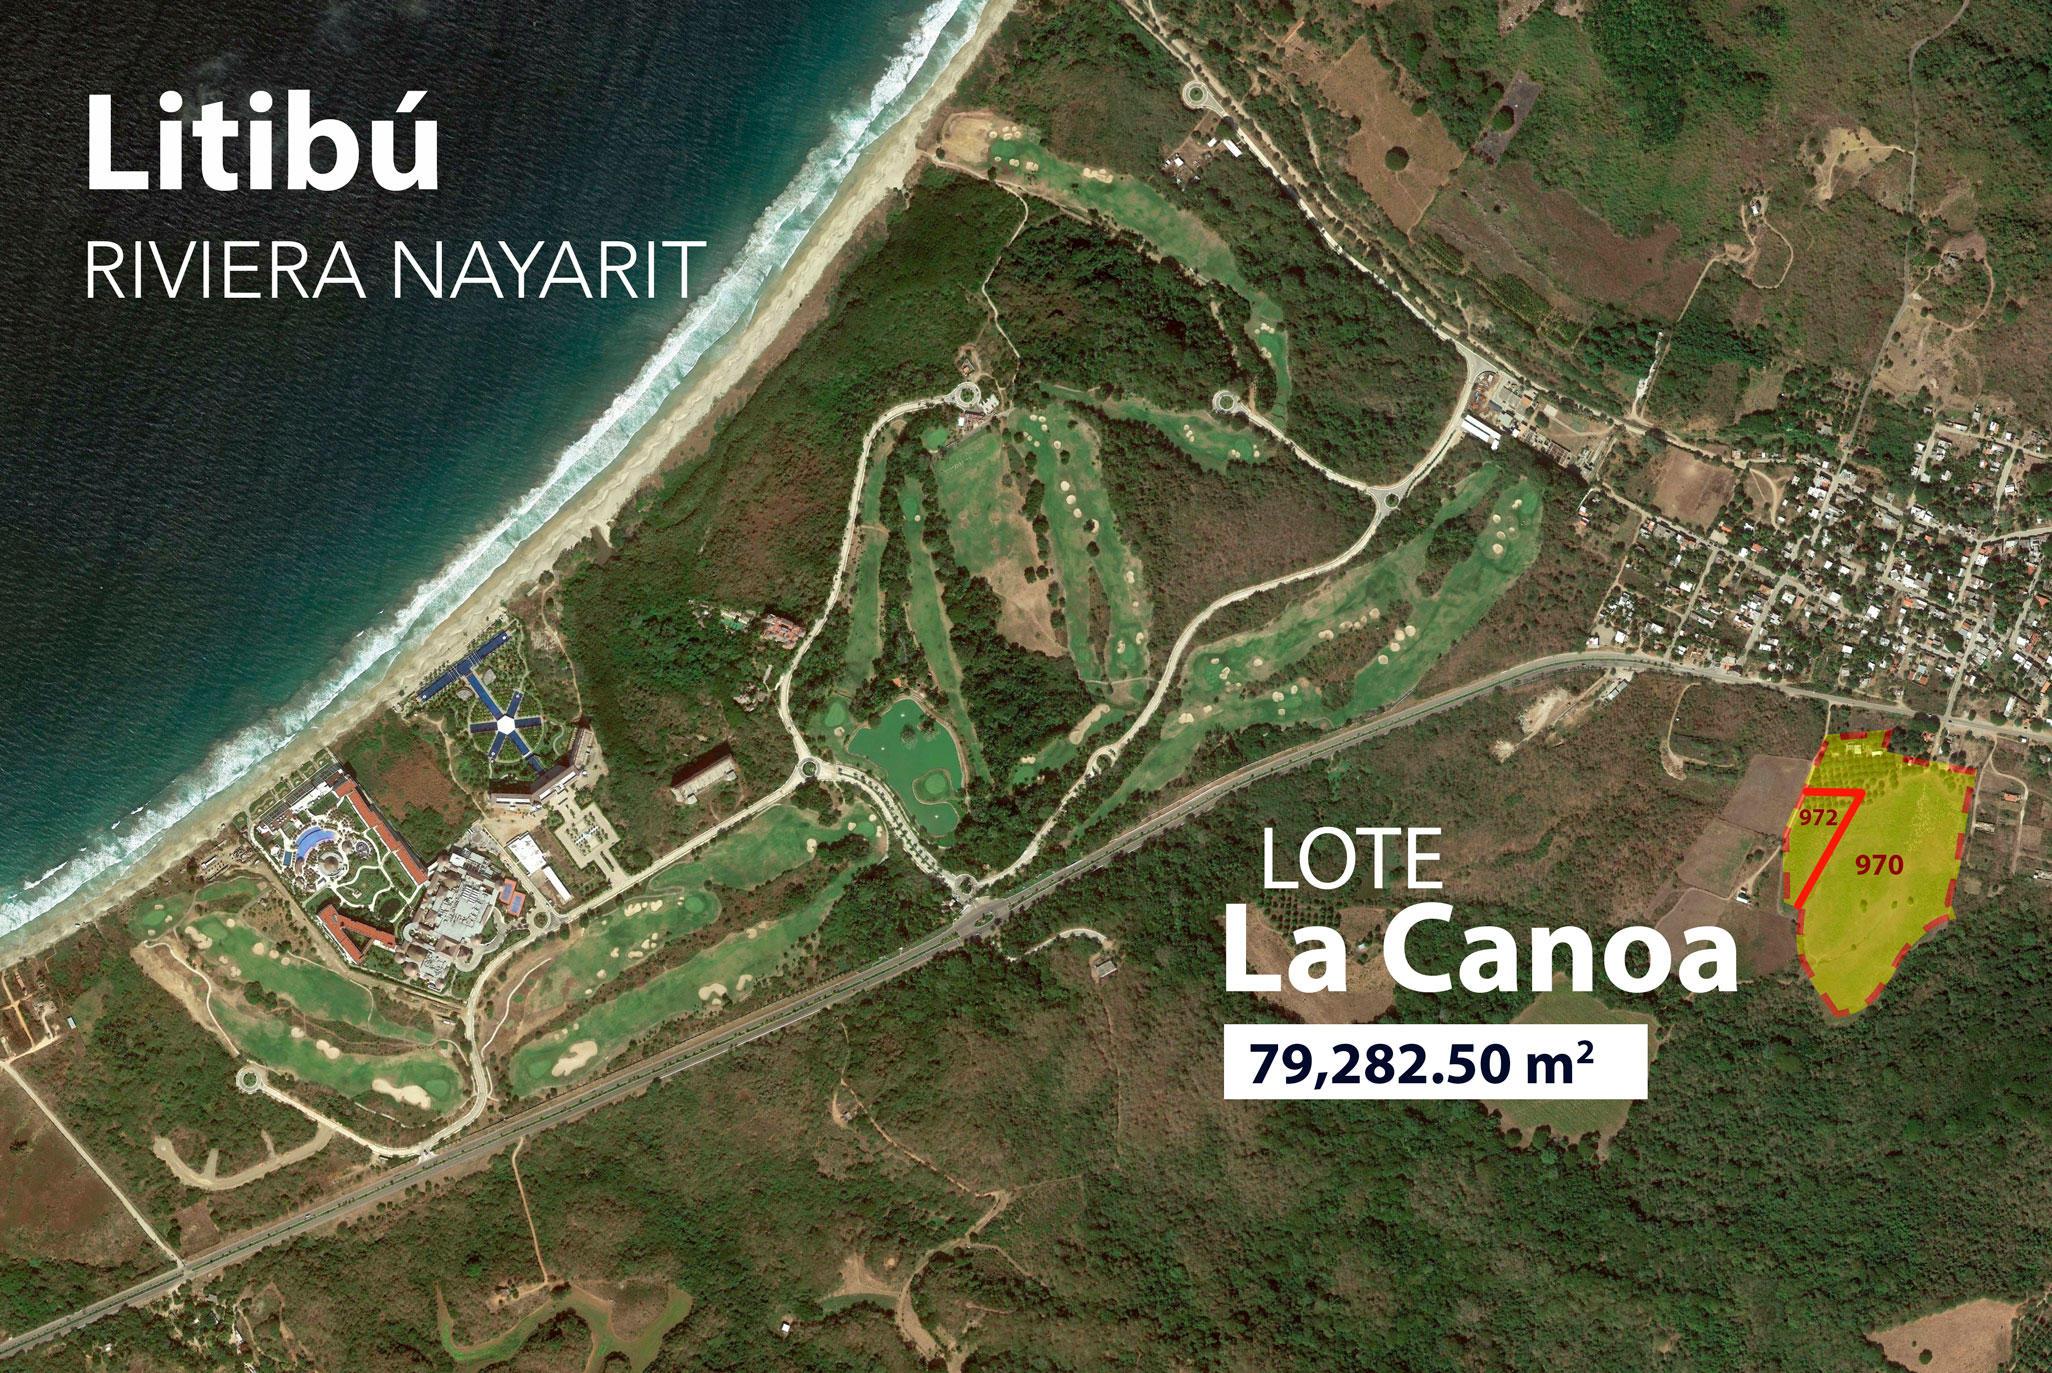 Litibu, ,Land,For Sale,Punta Mita - Sayulita,17175